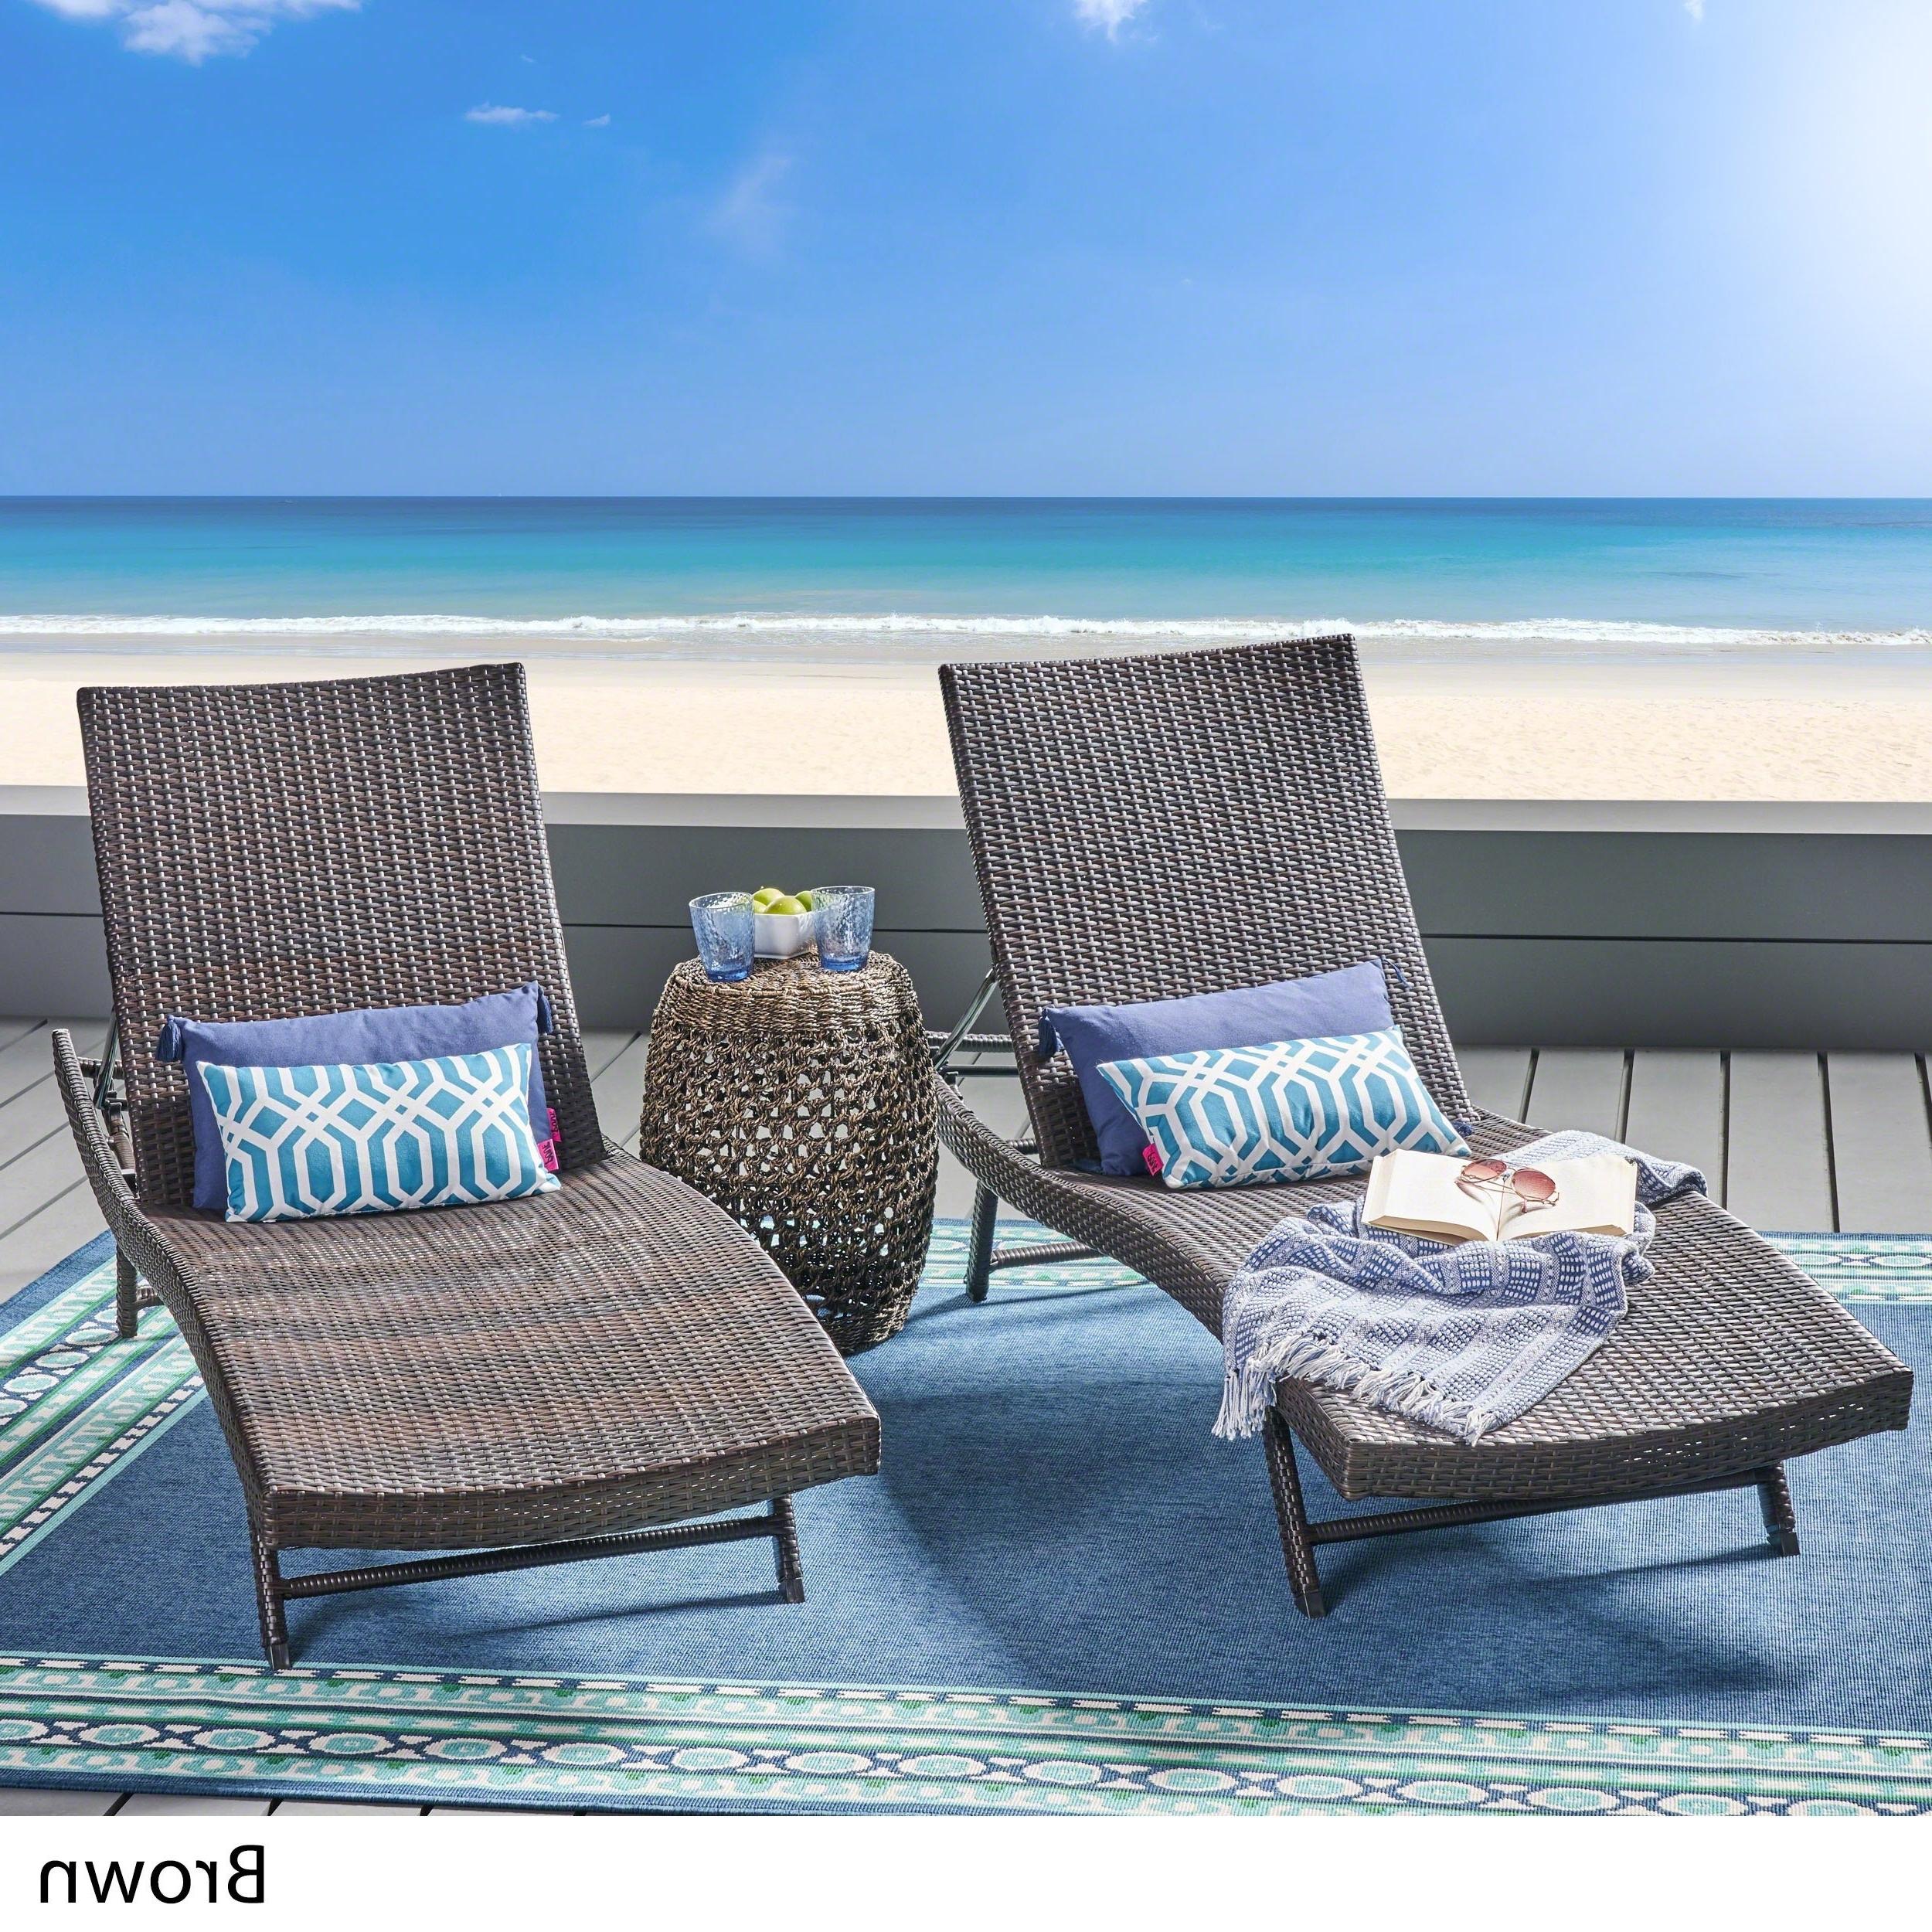 Kauai Outdoor Wicker Chaise Lounge (Set Of 2)Christopher Knight Home Inside Preferred Kauai Outdoor Wicker Chaise Lounges (View 5 of 25)